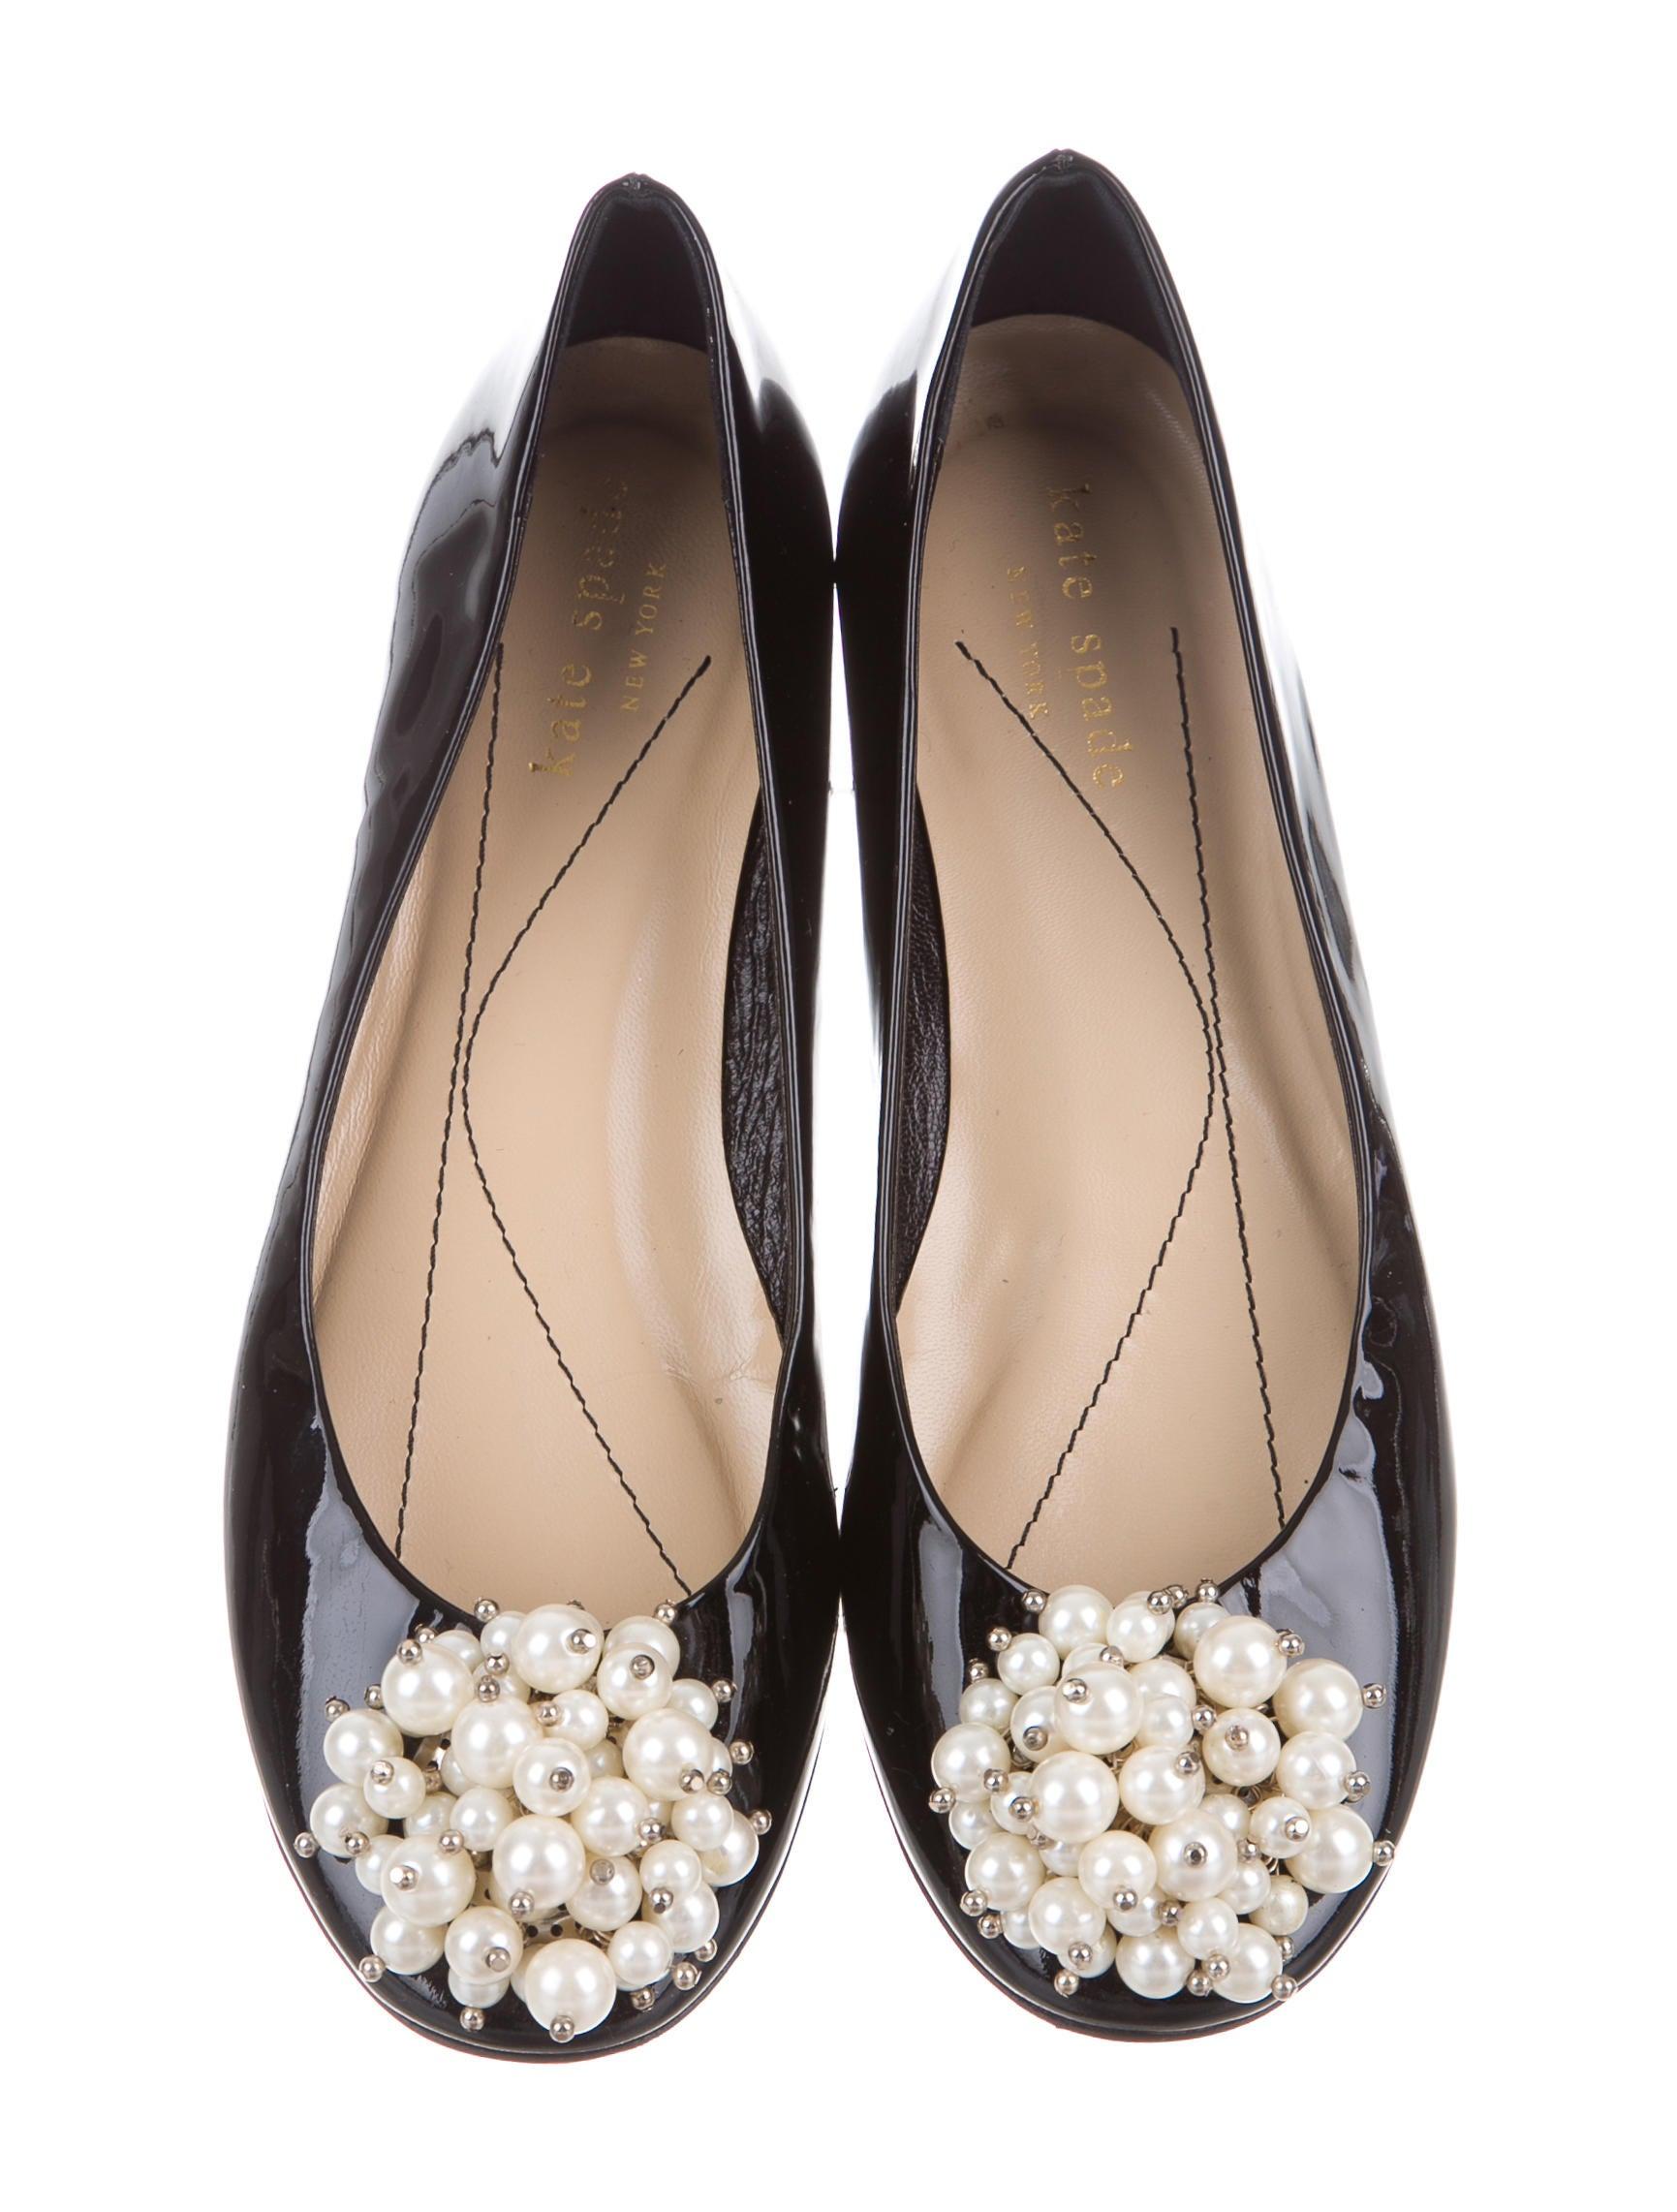 Kate spade new york embellished round toe flats shoes for Kate spade new york flats